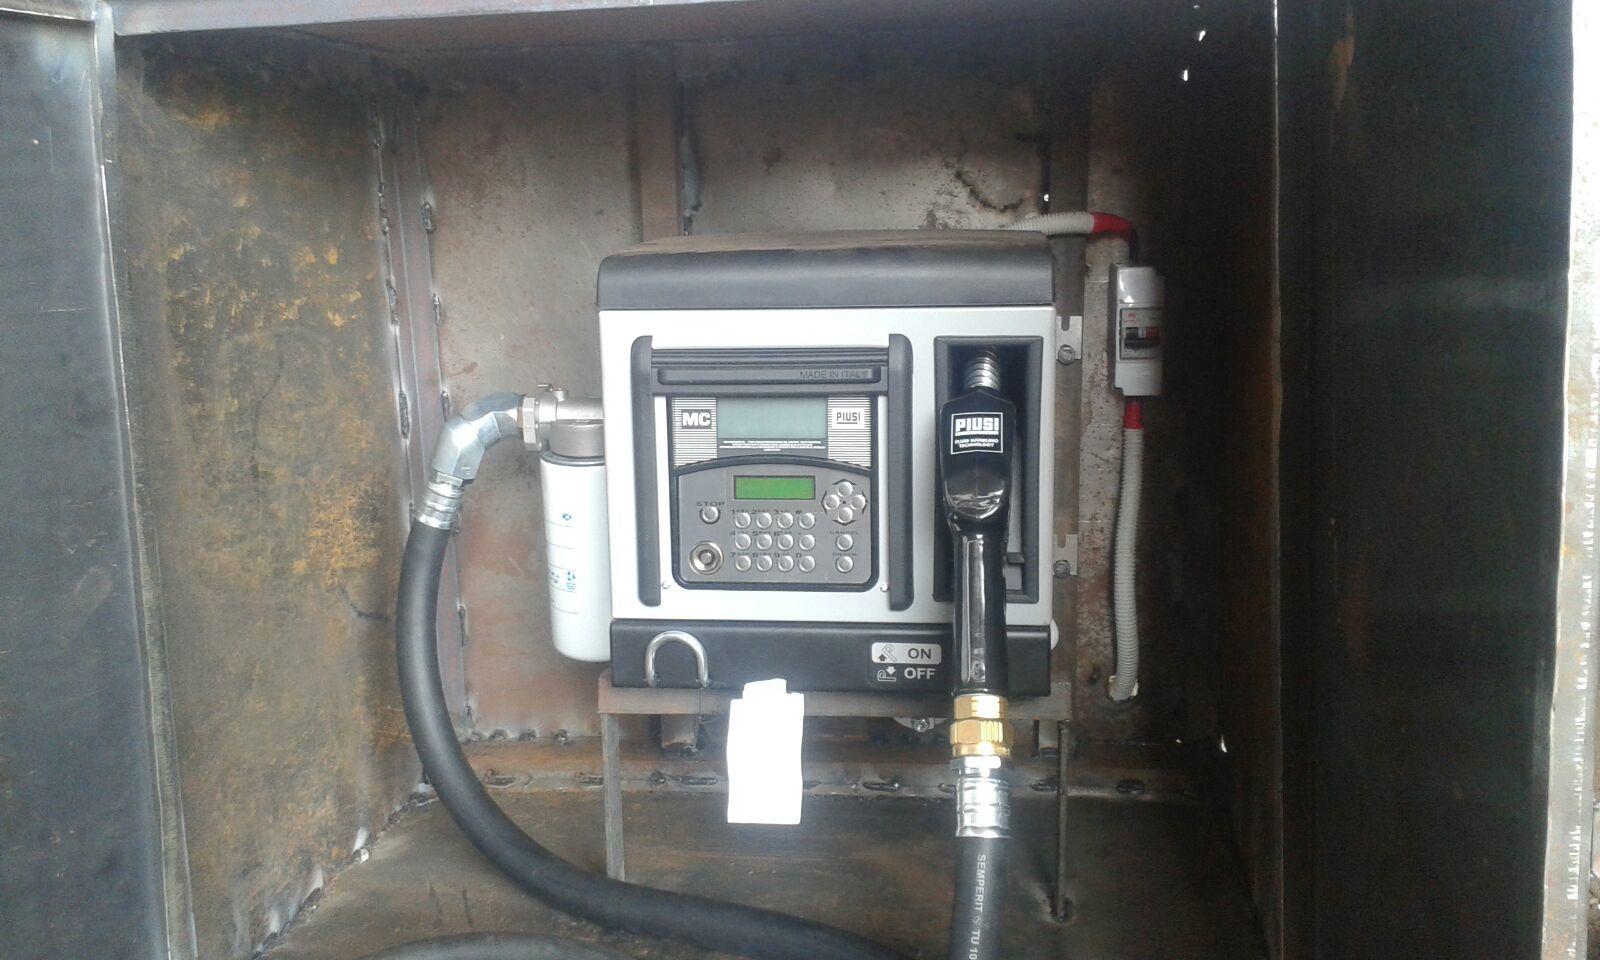 Piusi Cube-70 MC Fuel Dispensing Pump